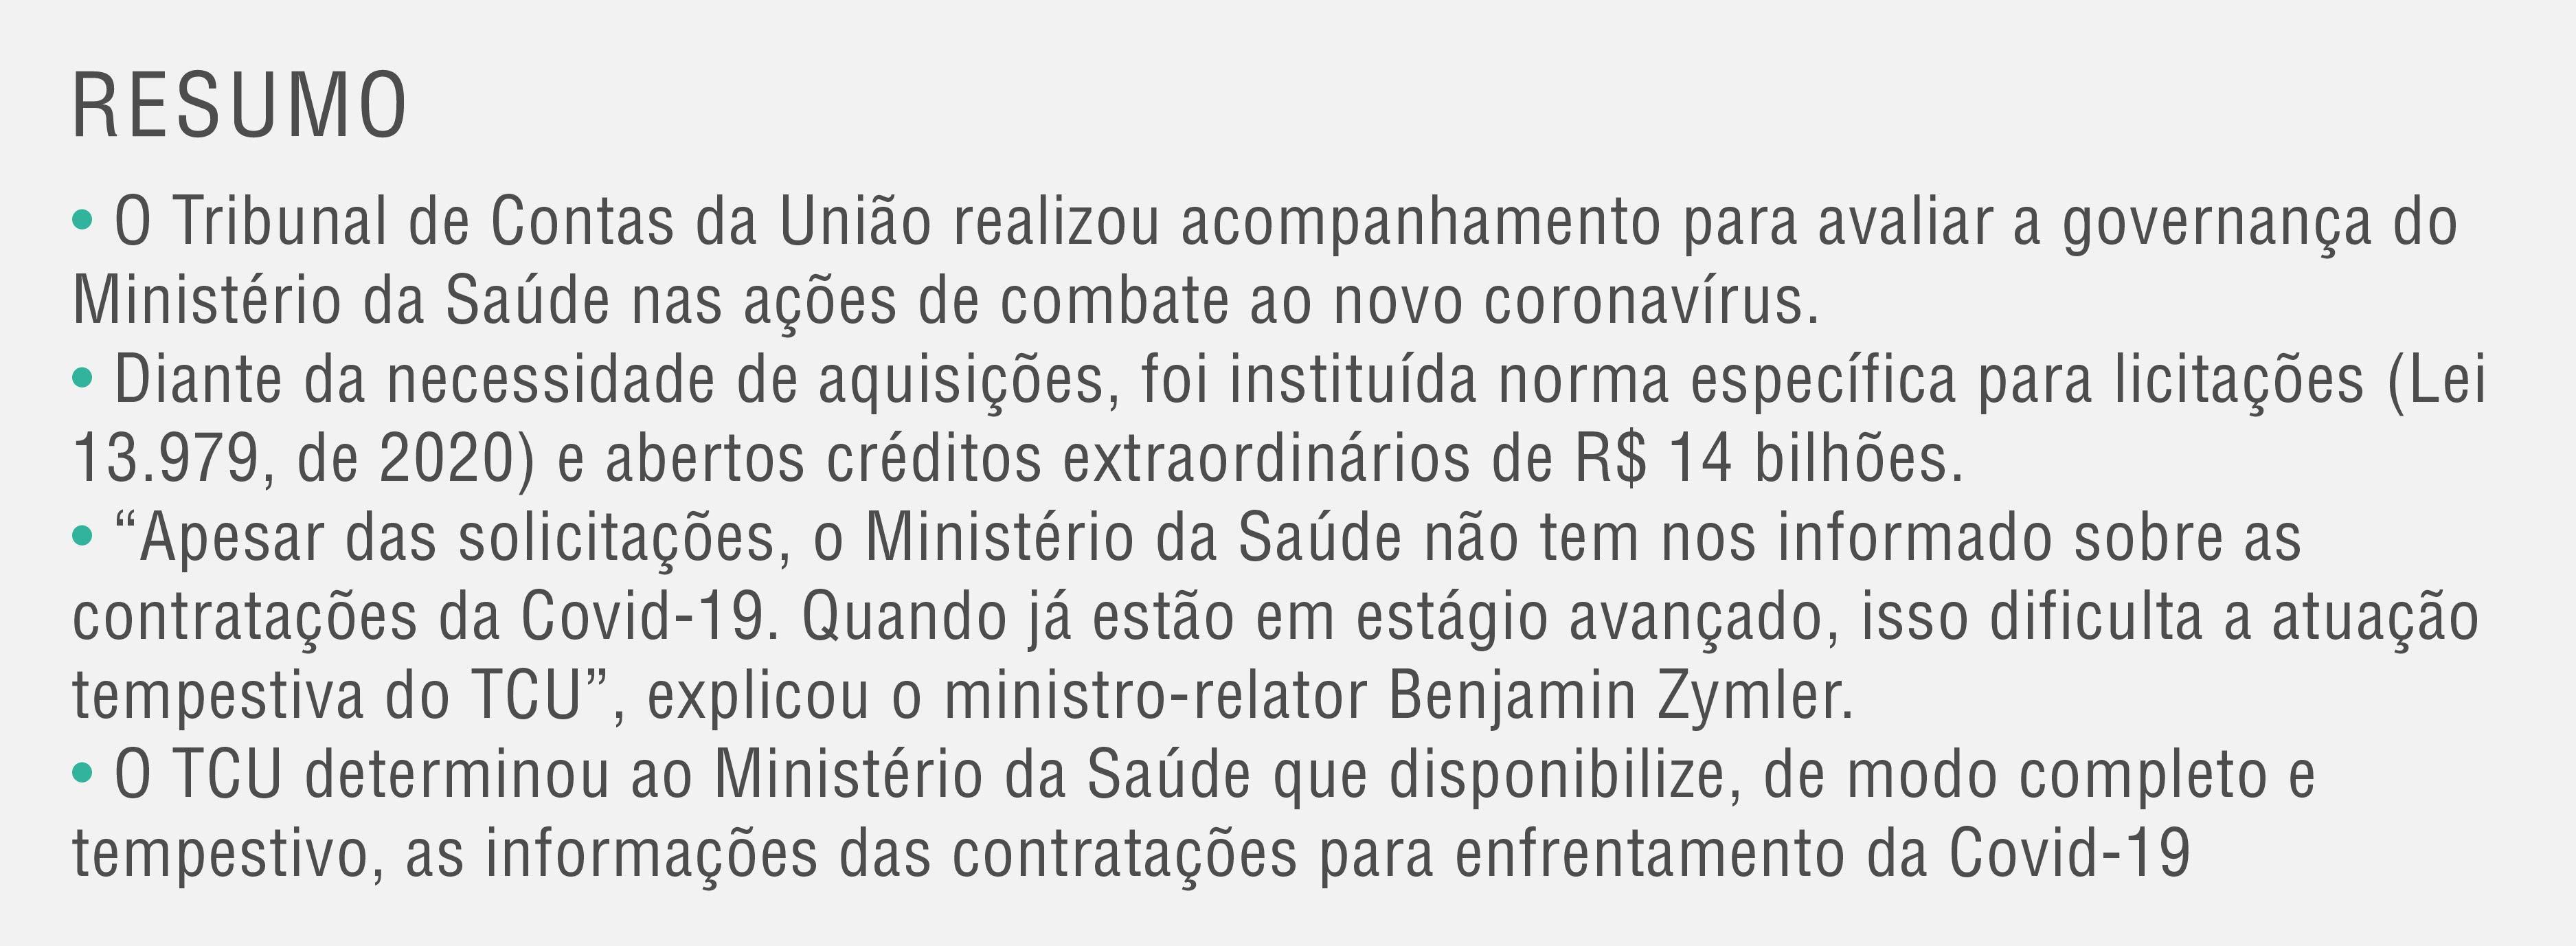 Quadro_resumo_padrao_destaque-01.jpg